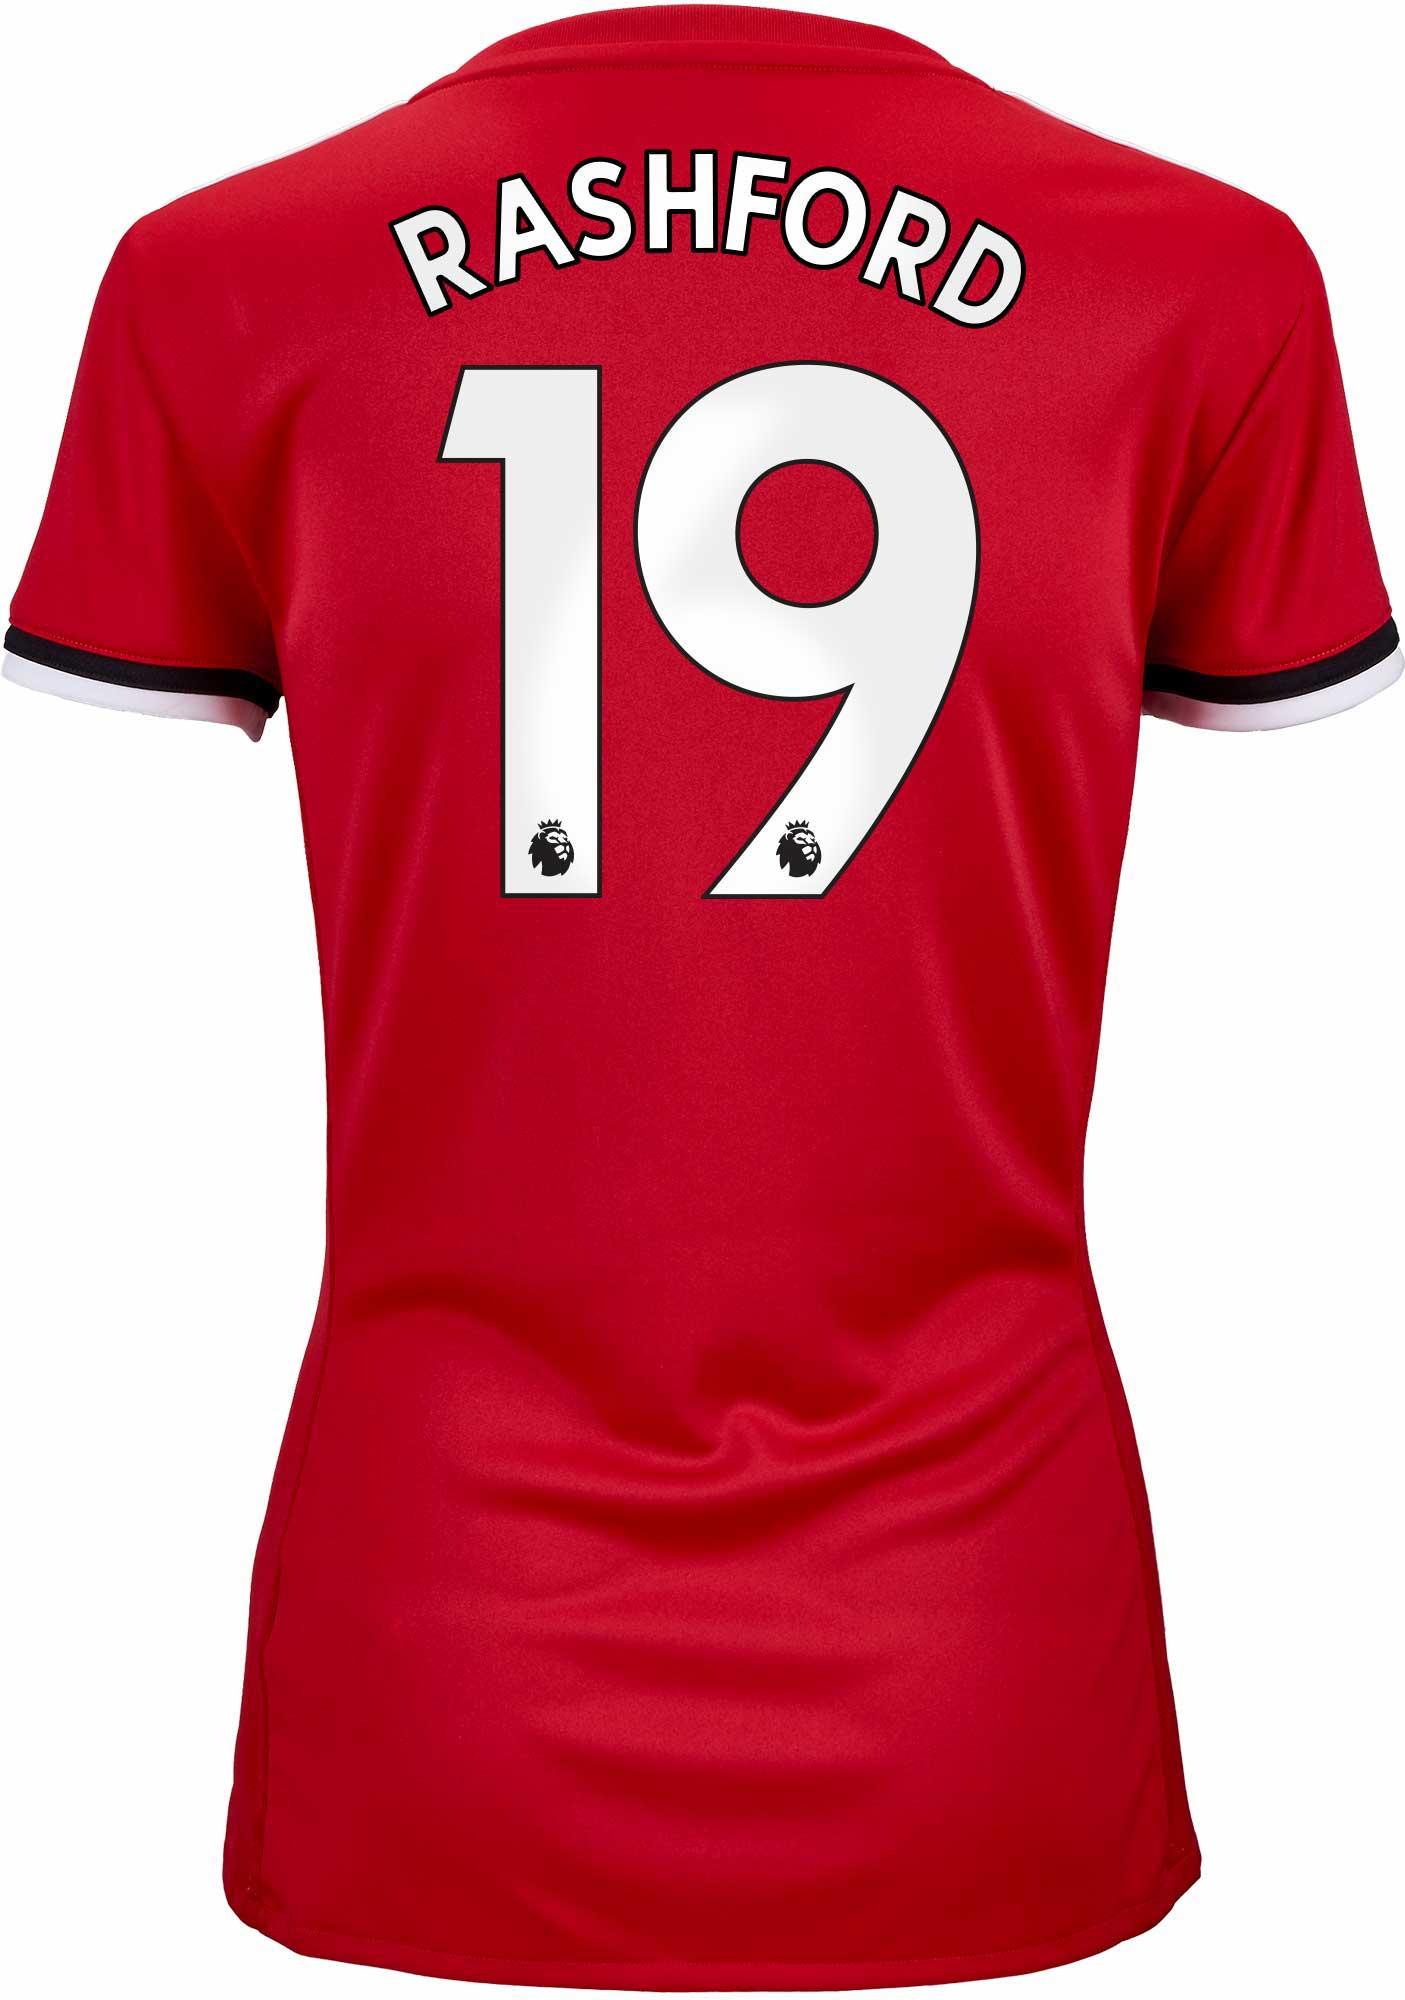 2017/18 adidas Womens Marcus Rashford Manchester United Home Jersey - SoccerPro